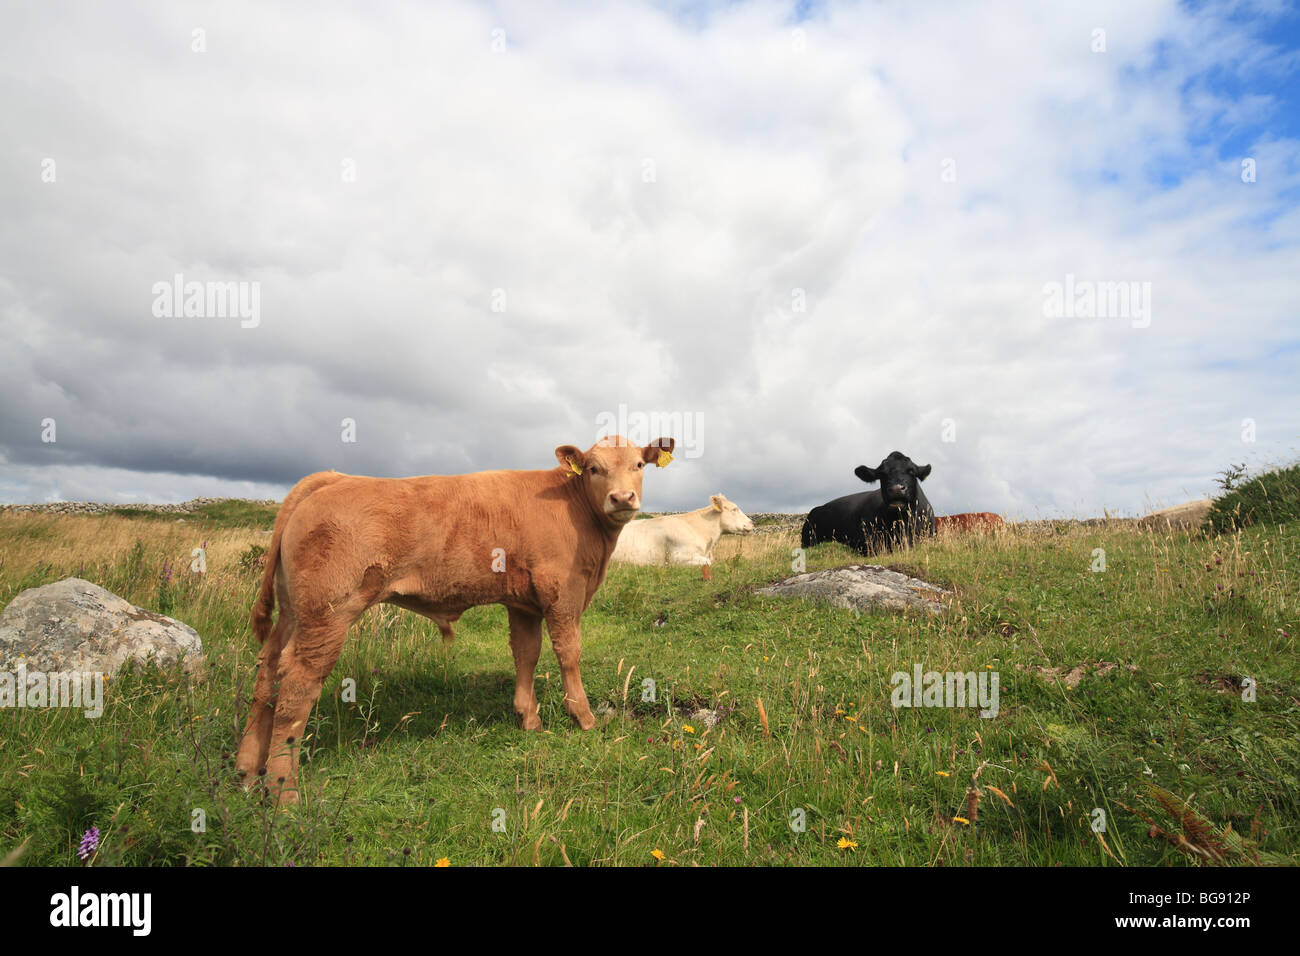 young fattening bull on grassland, Ireland - Stock Image